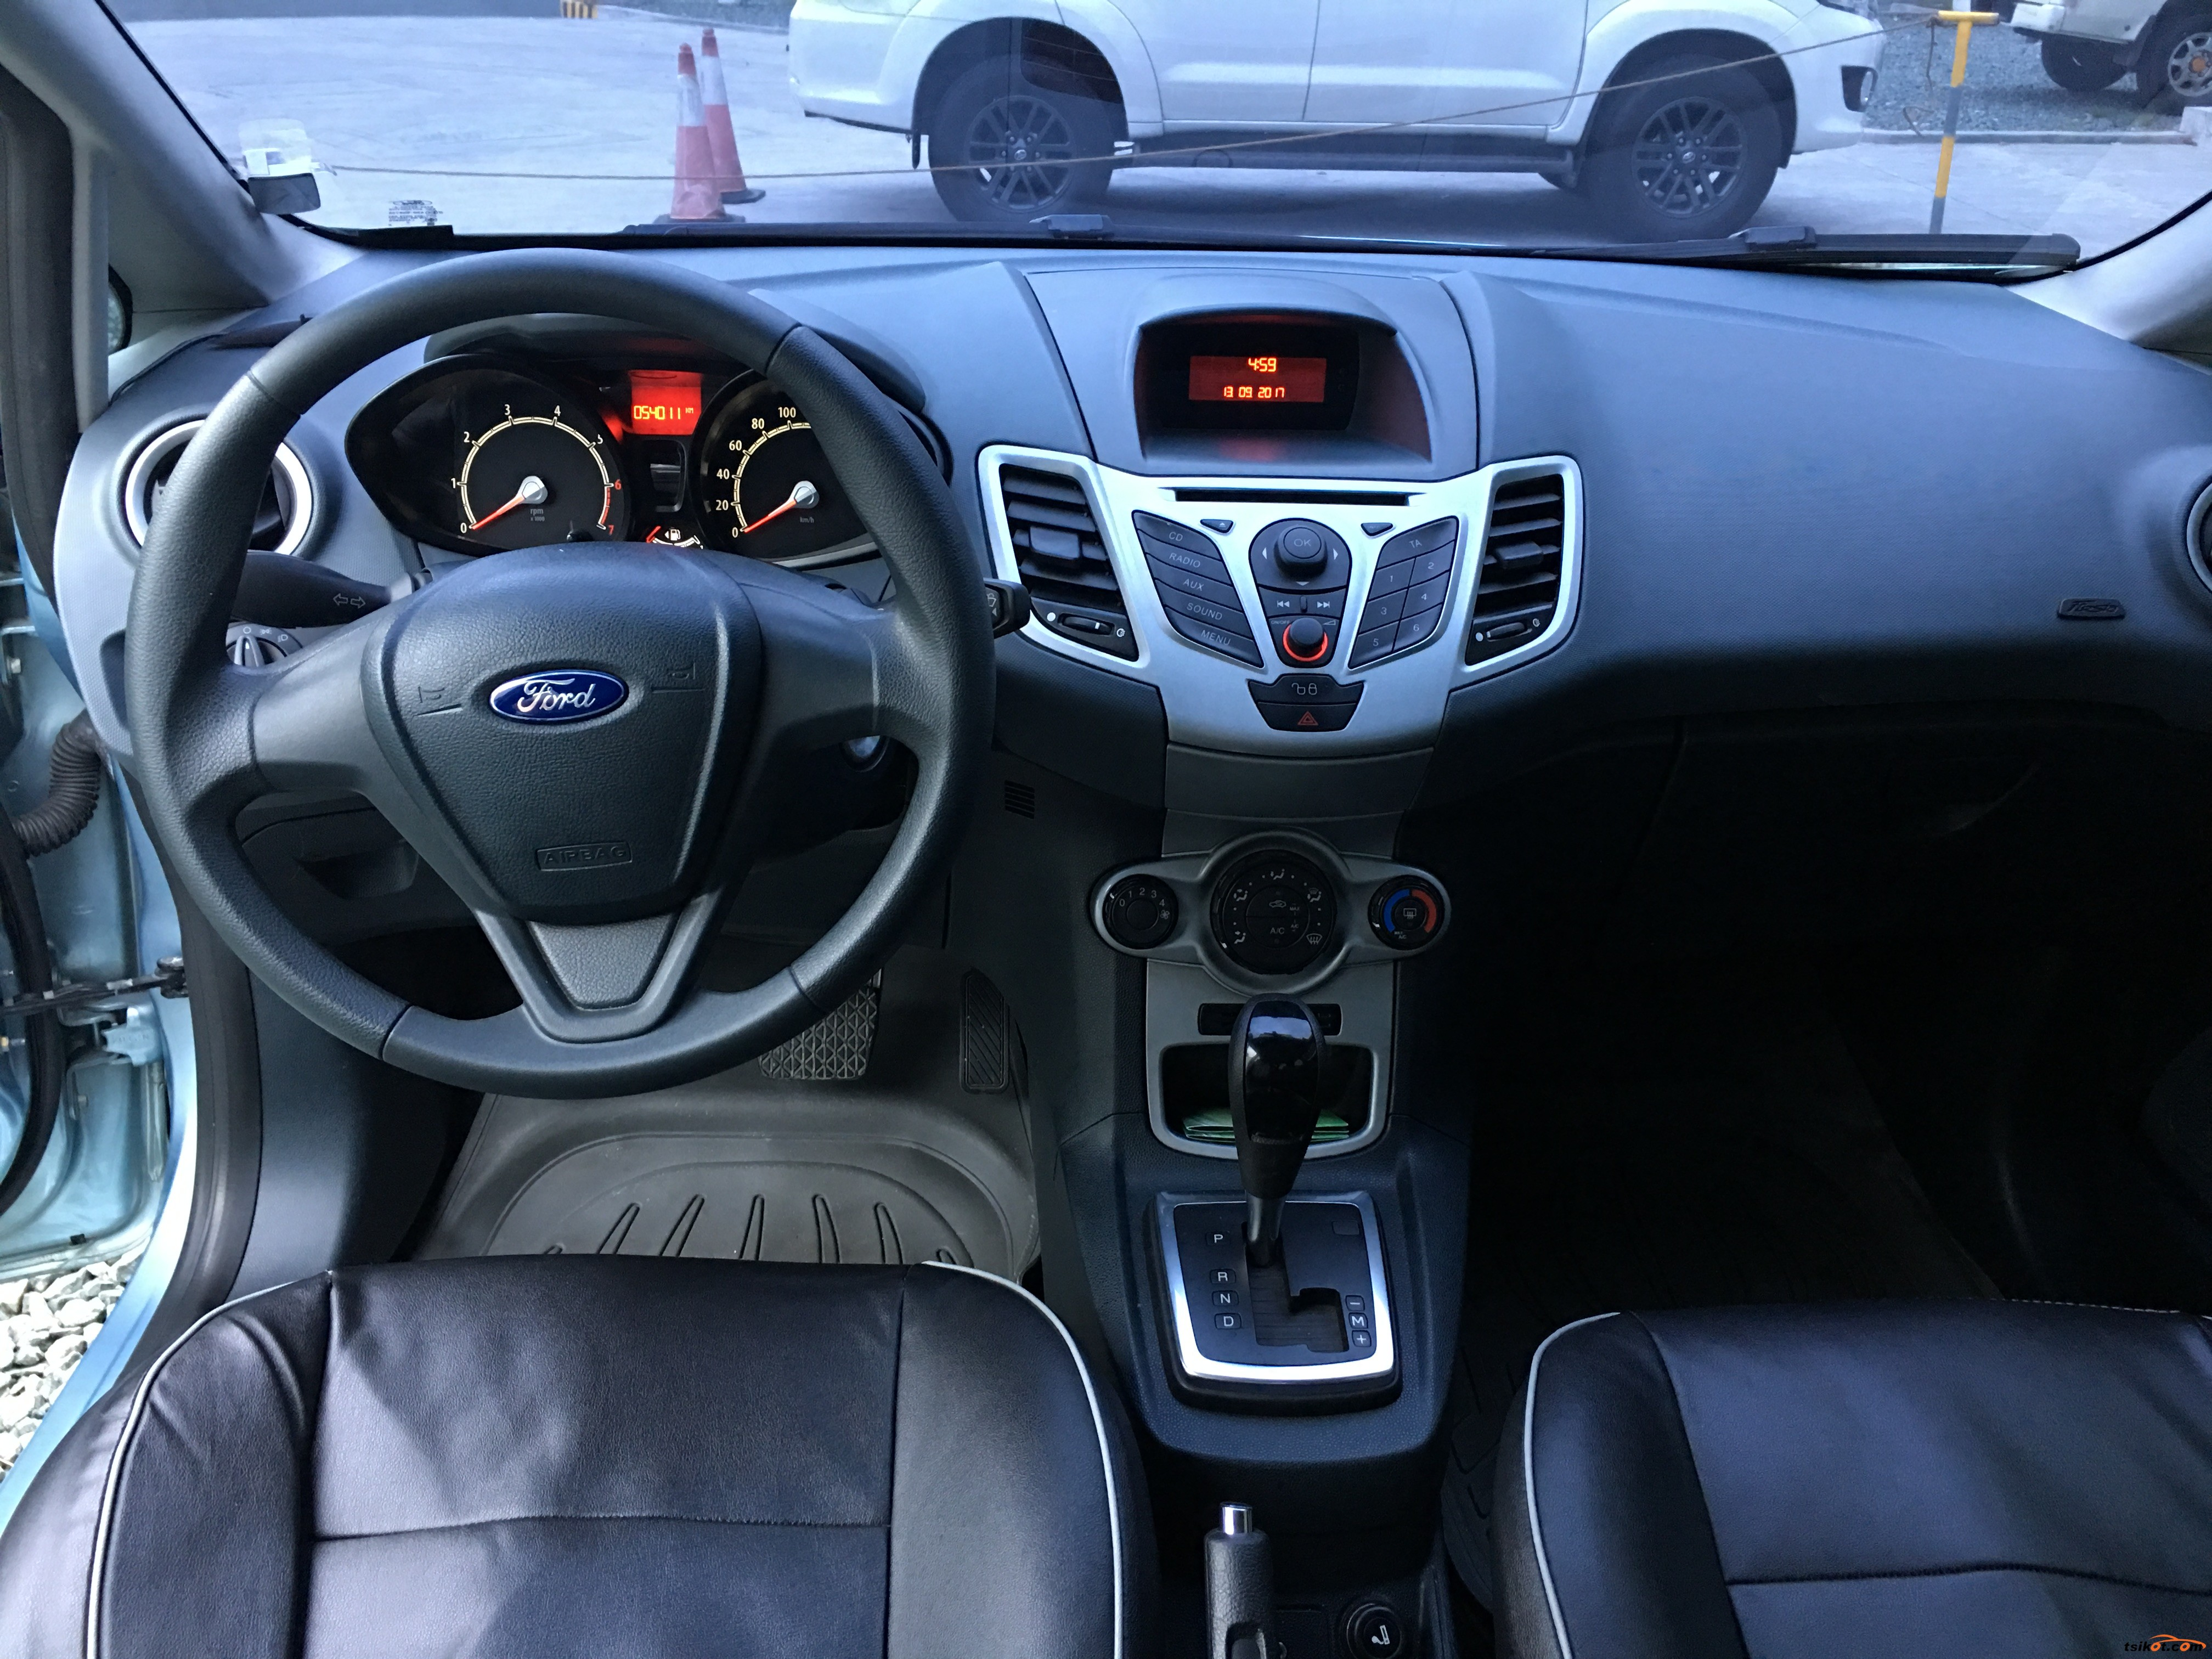 Ford Fiesta 2013 - 6